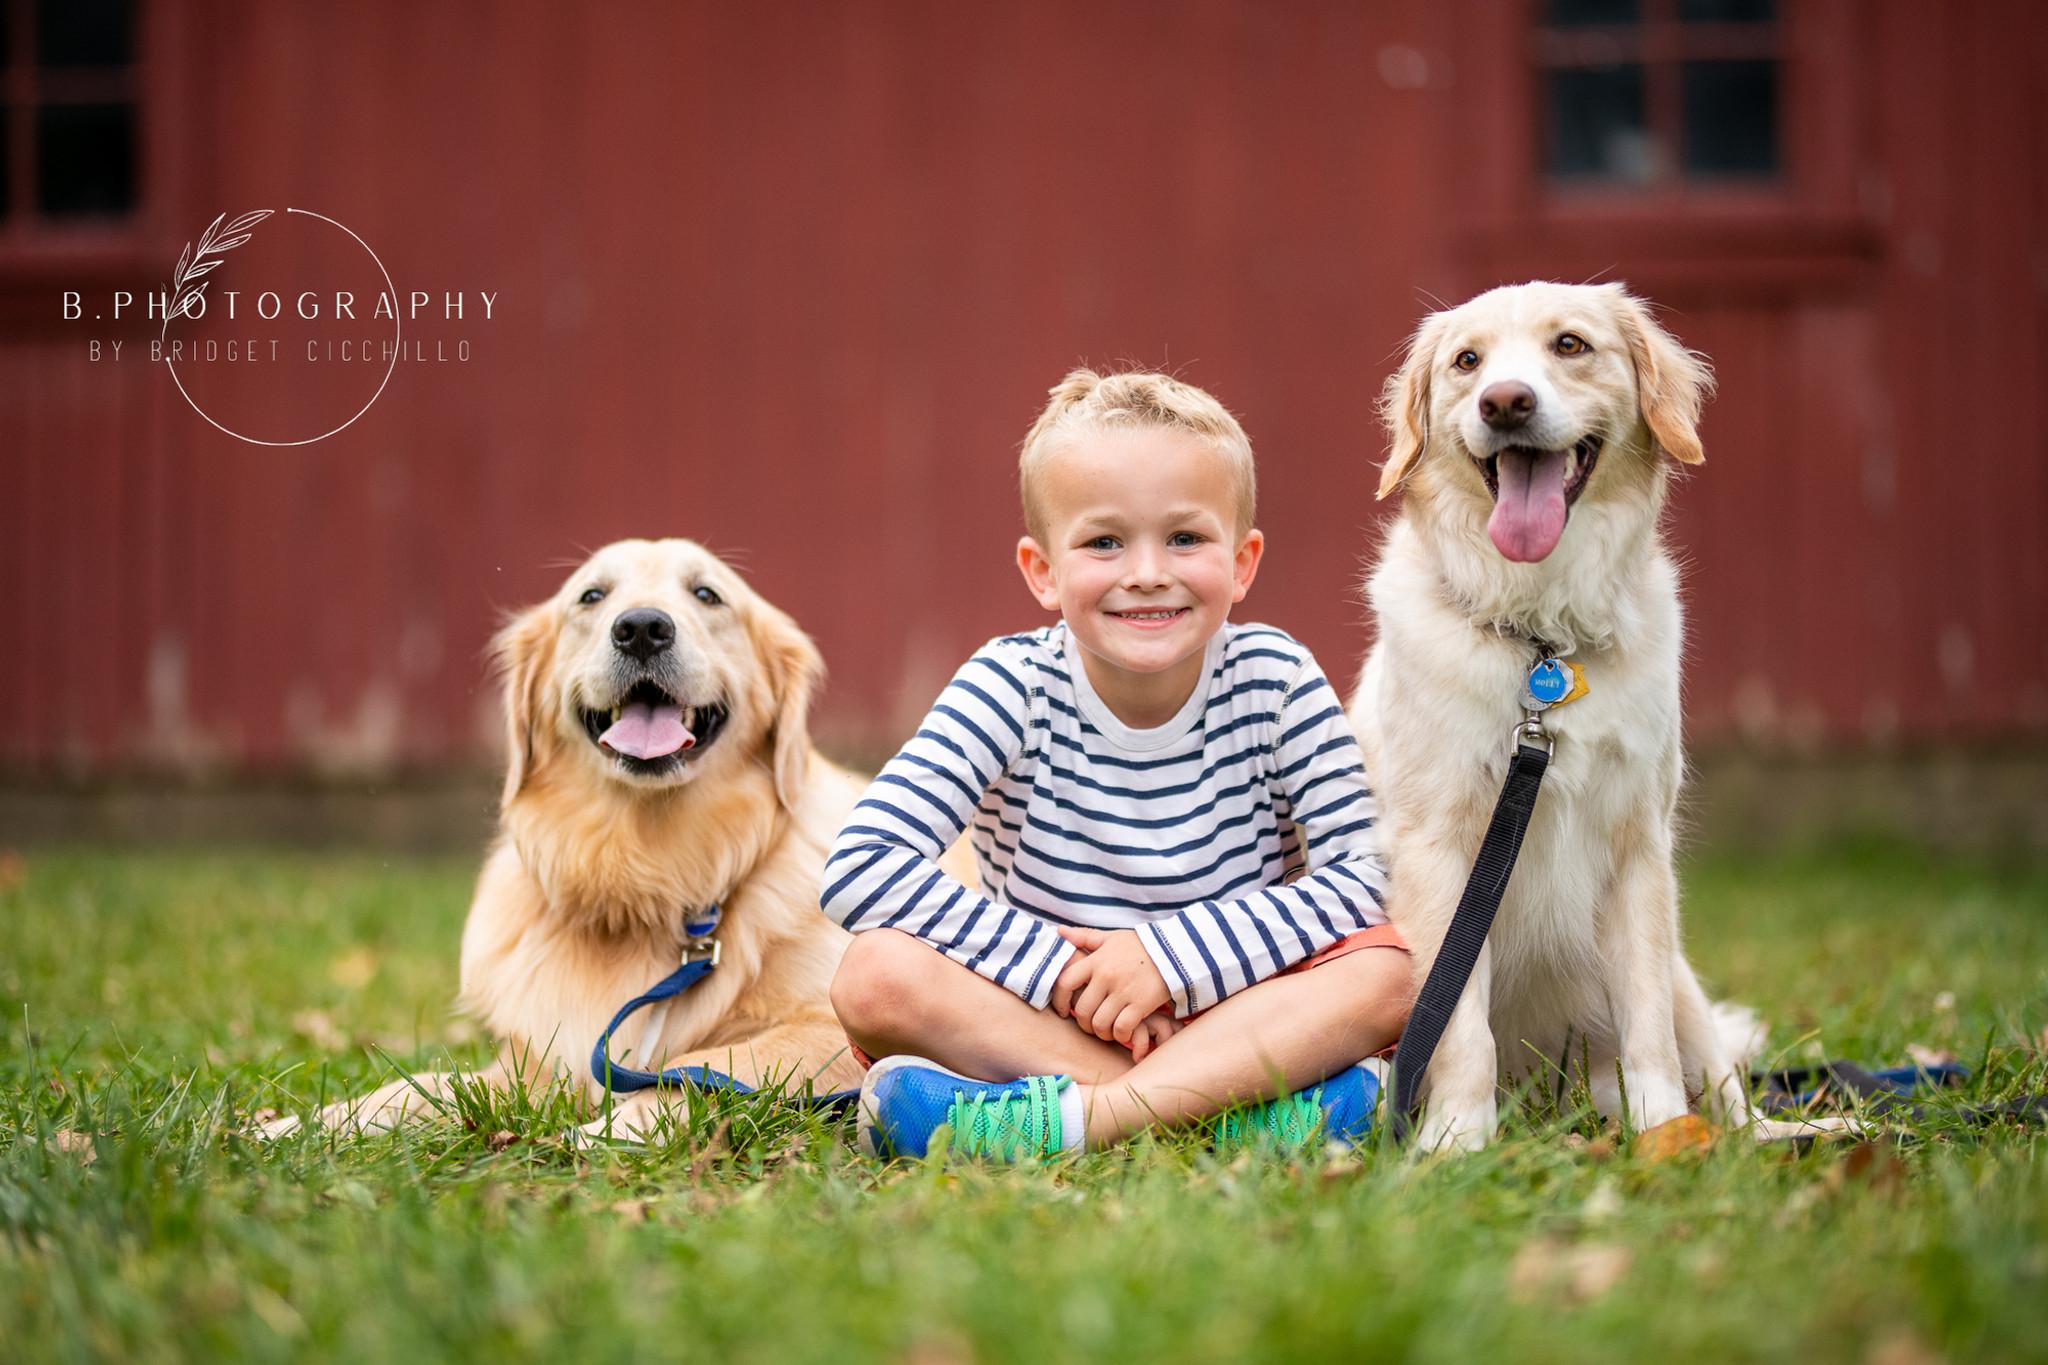 Pet Portraits Benefiting HSHC